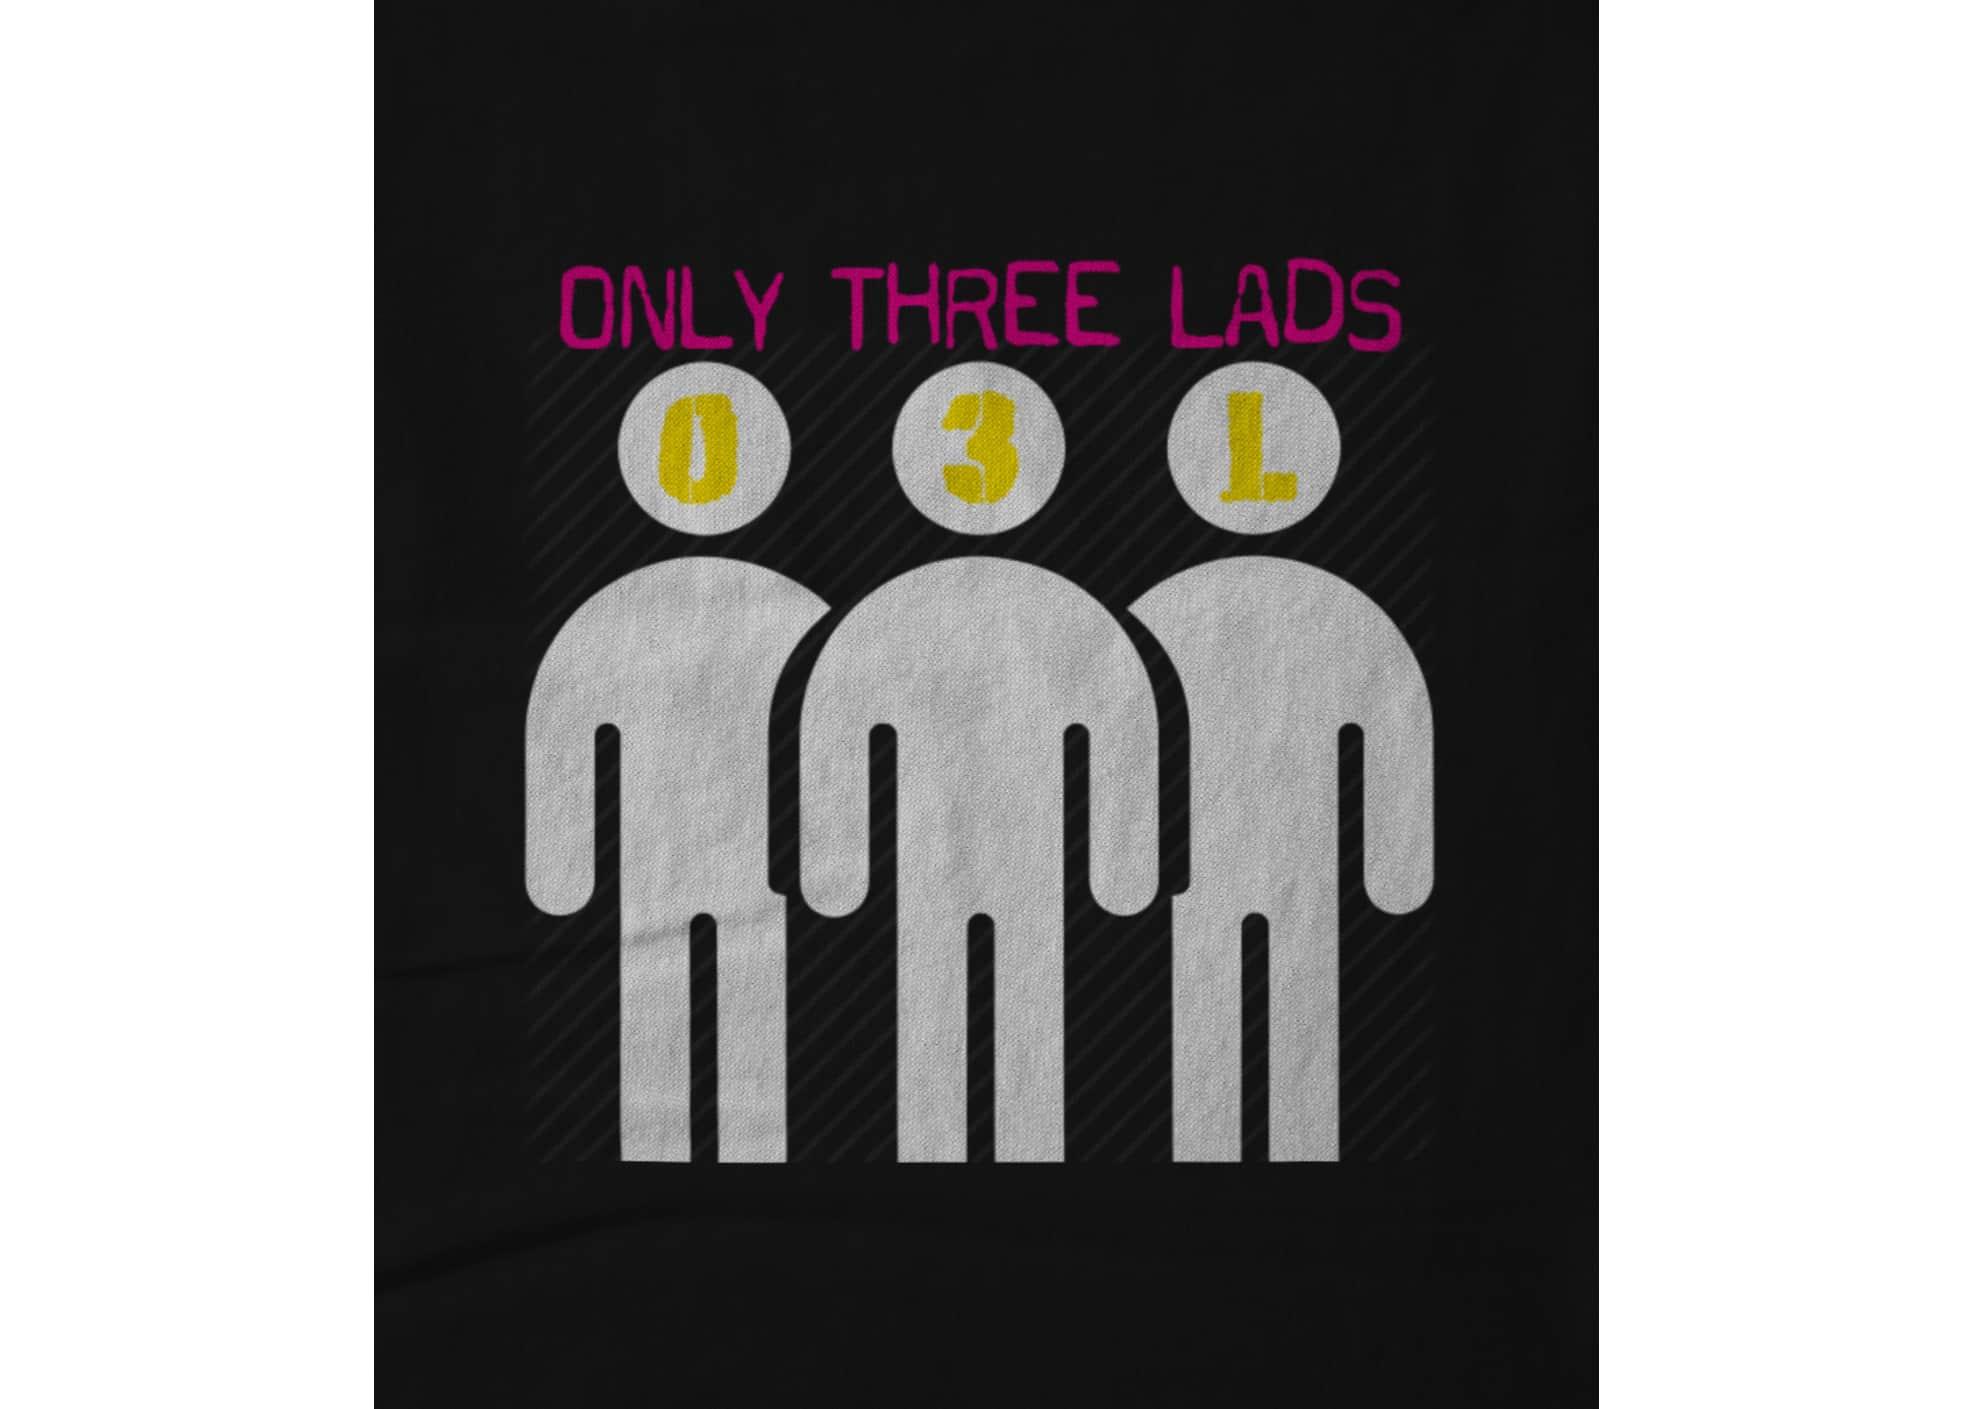 Only three lads o3l podcast   logo design black 1579508607